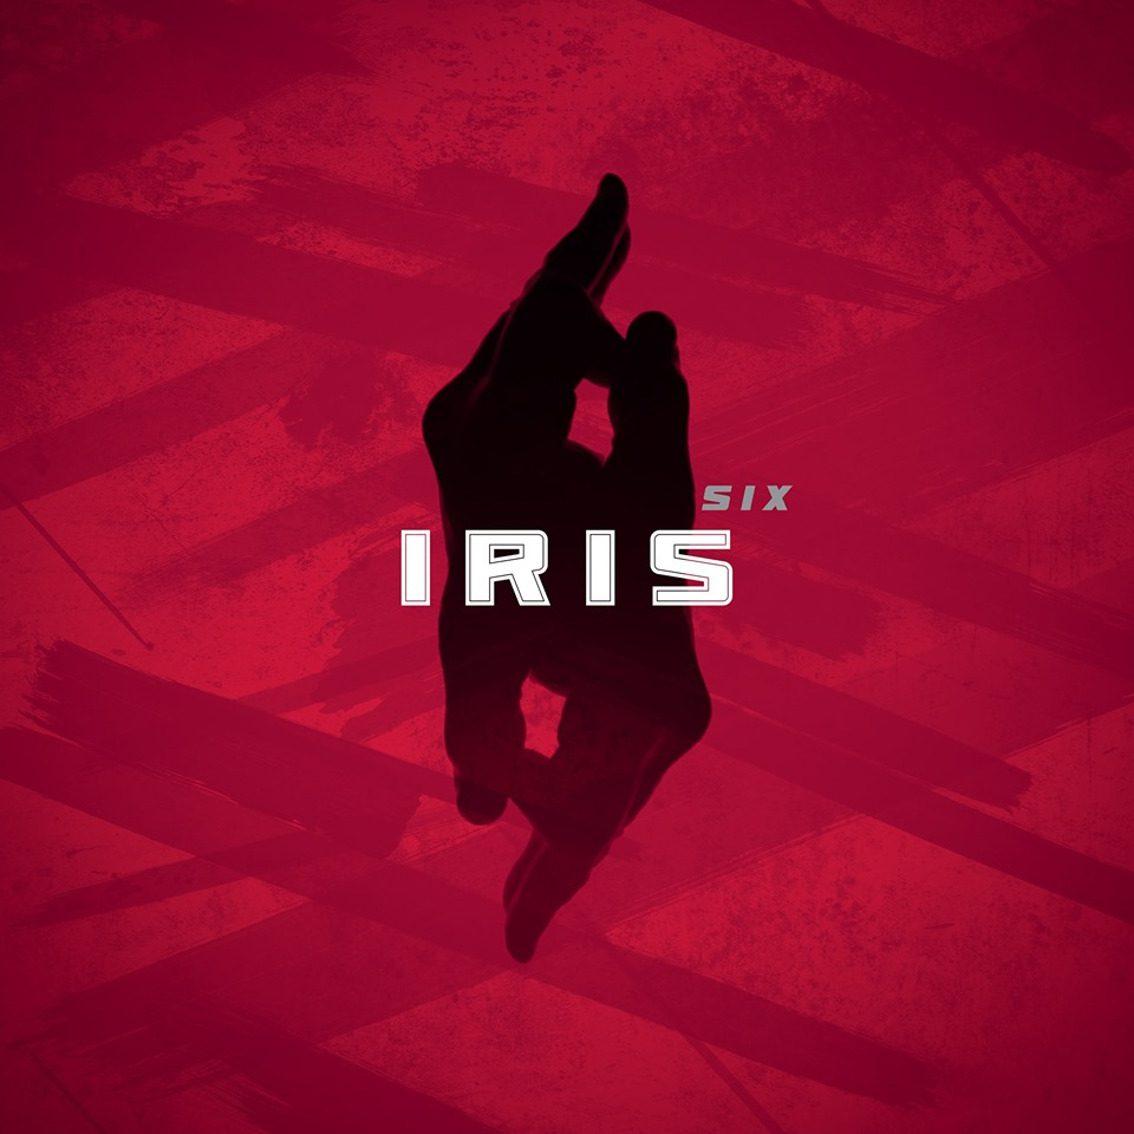 Synthpop act Iris returns with brand new album: 'Six'